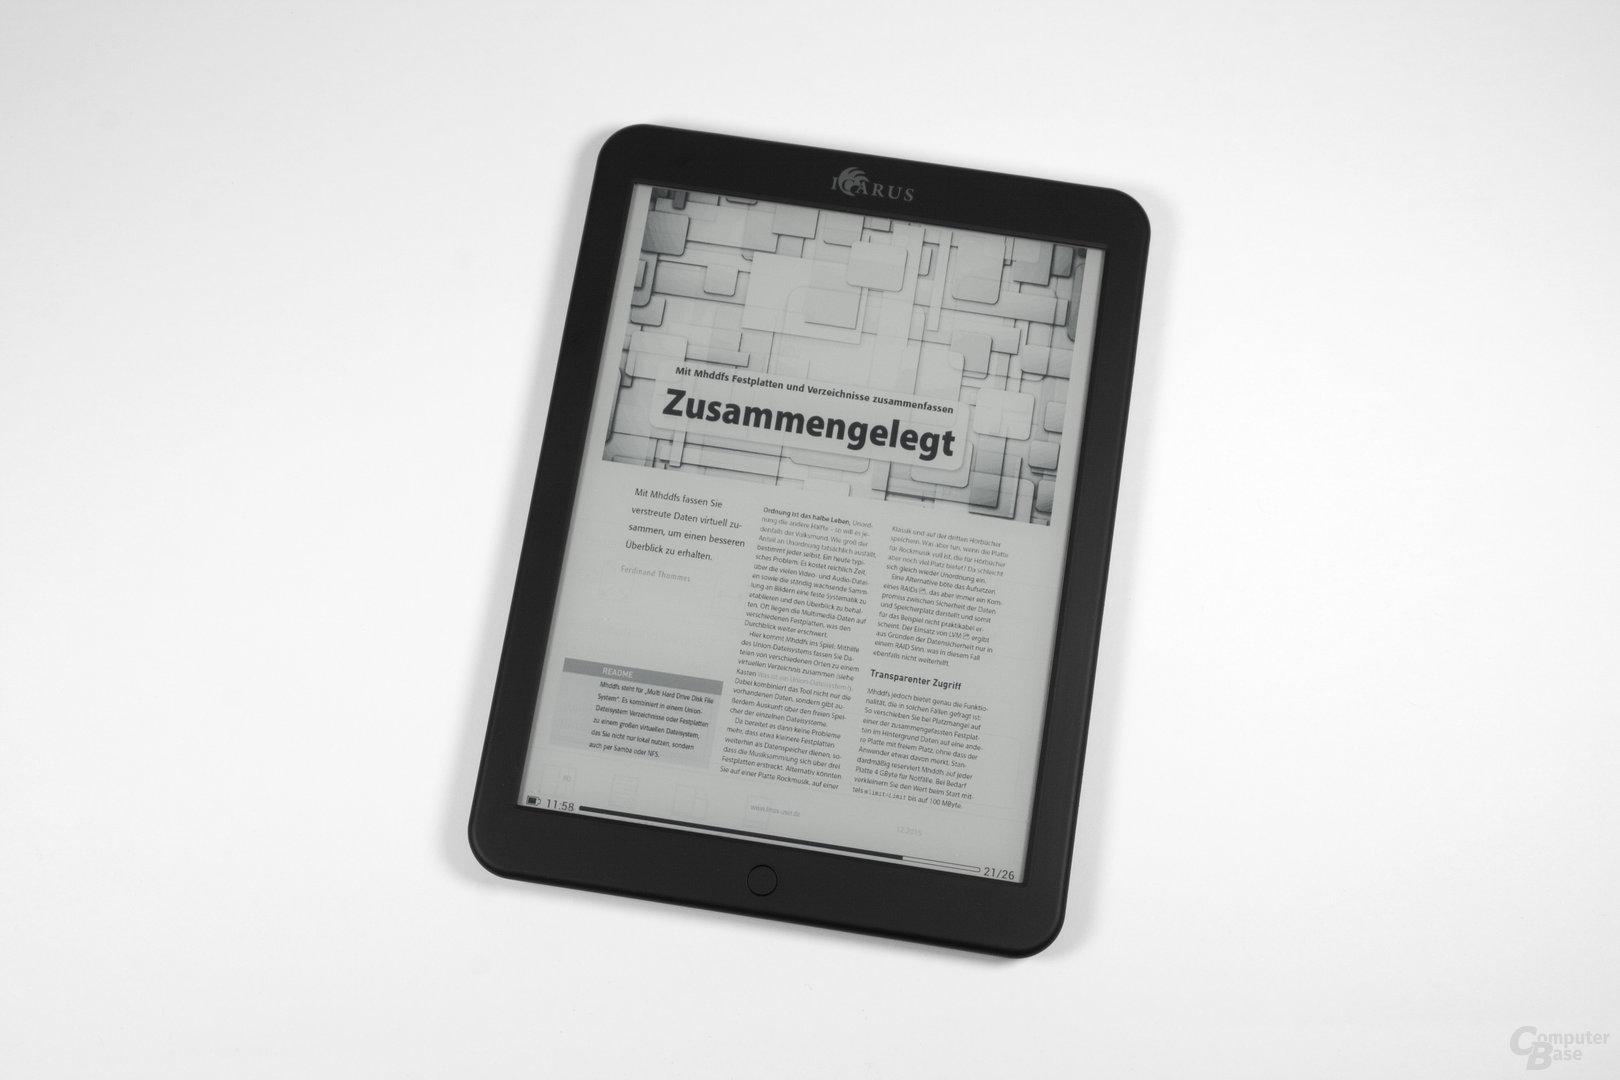 PDF-Darstellung beim Icarus Illumina XL